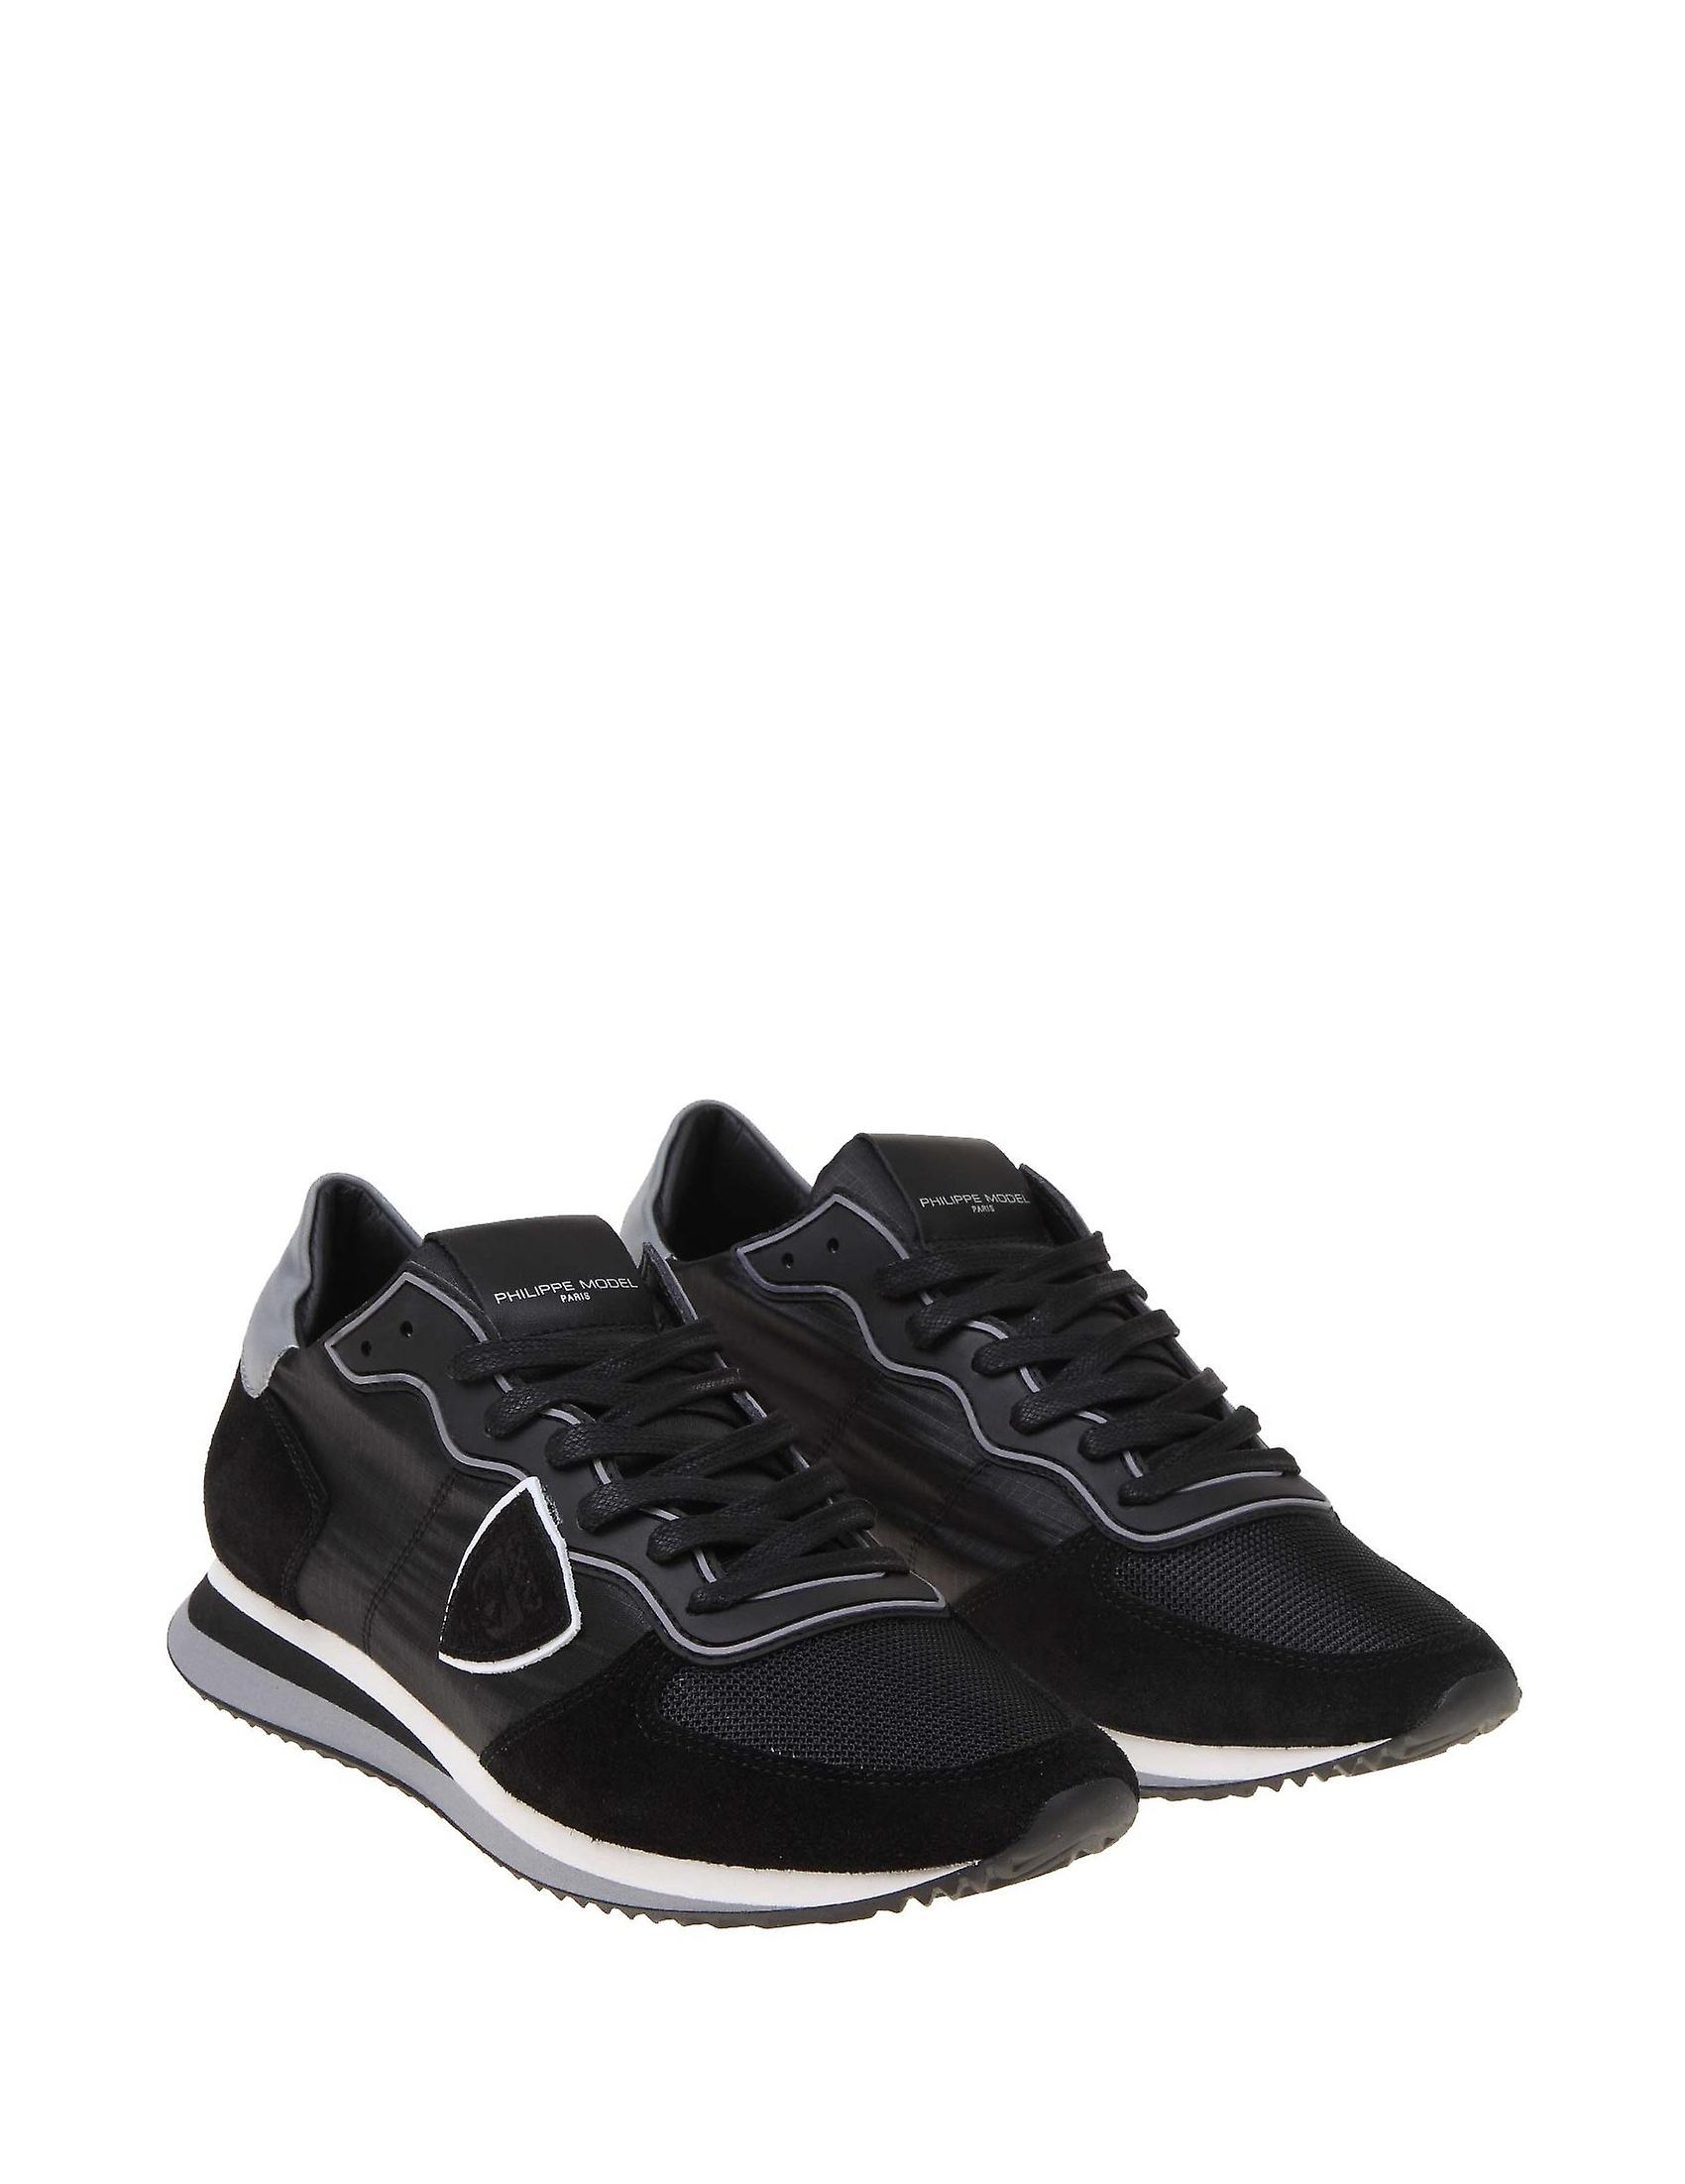 Philippe Model Tzluwb10 Uomo' s Sneakers in pelle nera 63ue7s